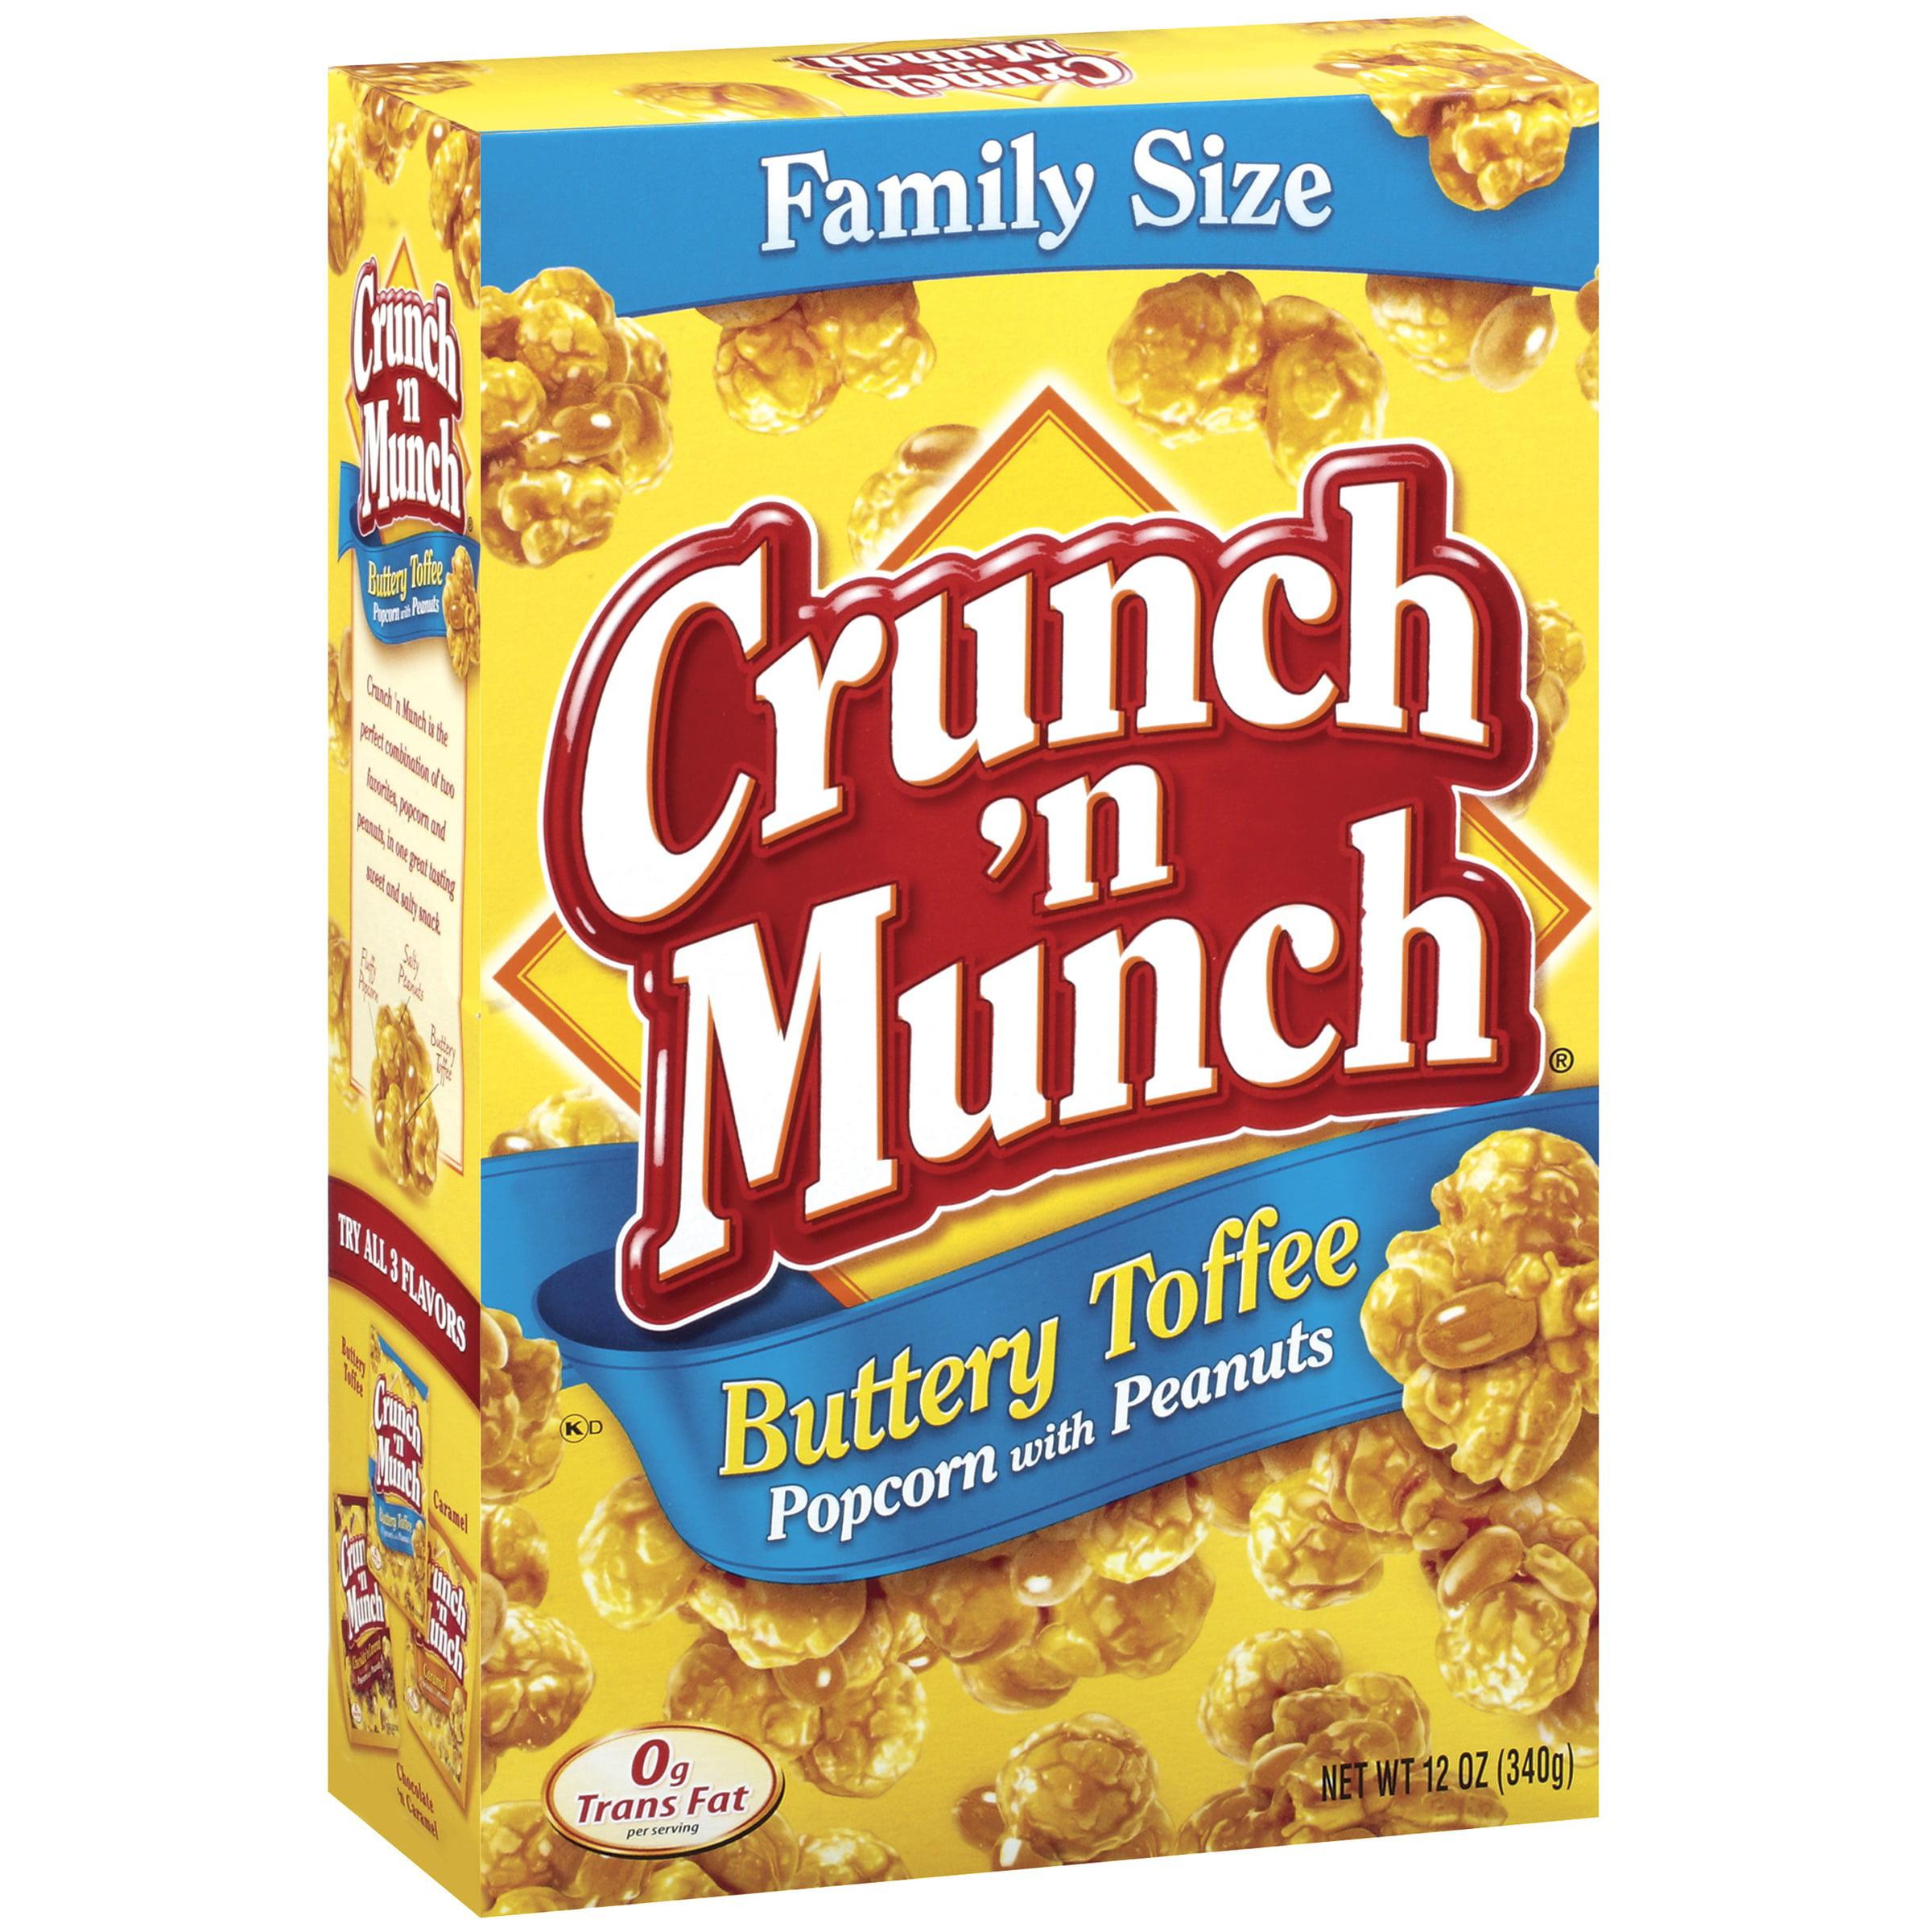 Crunch 'n Munch Buttery Toffee W Peanuts Popcorn 12 Oz Box by ConAgra Foods Inc.